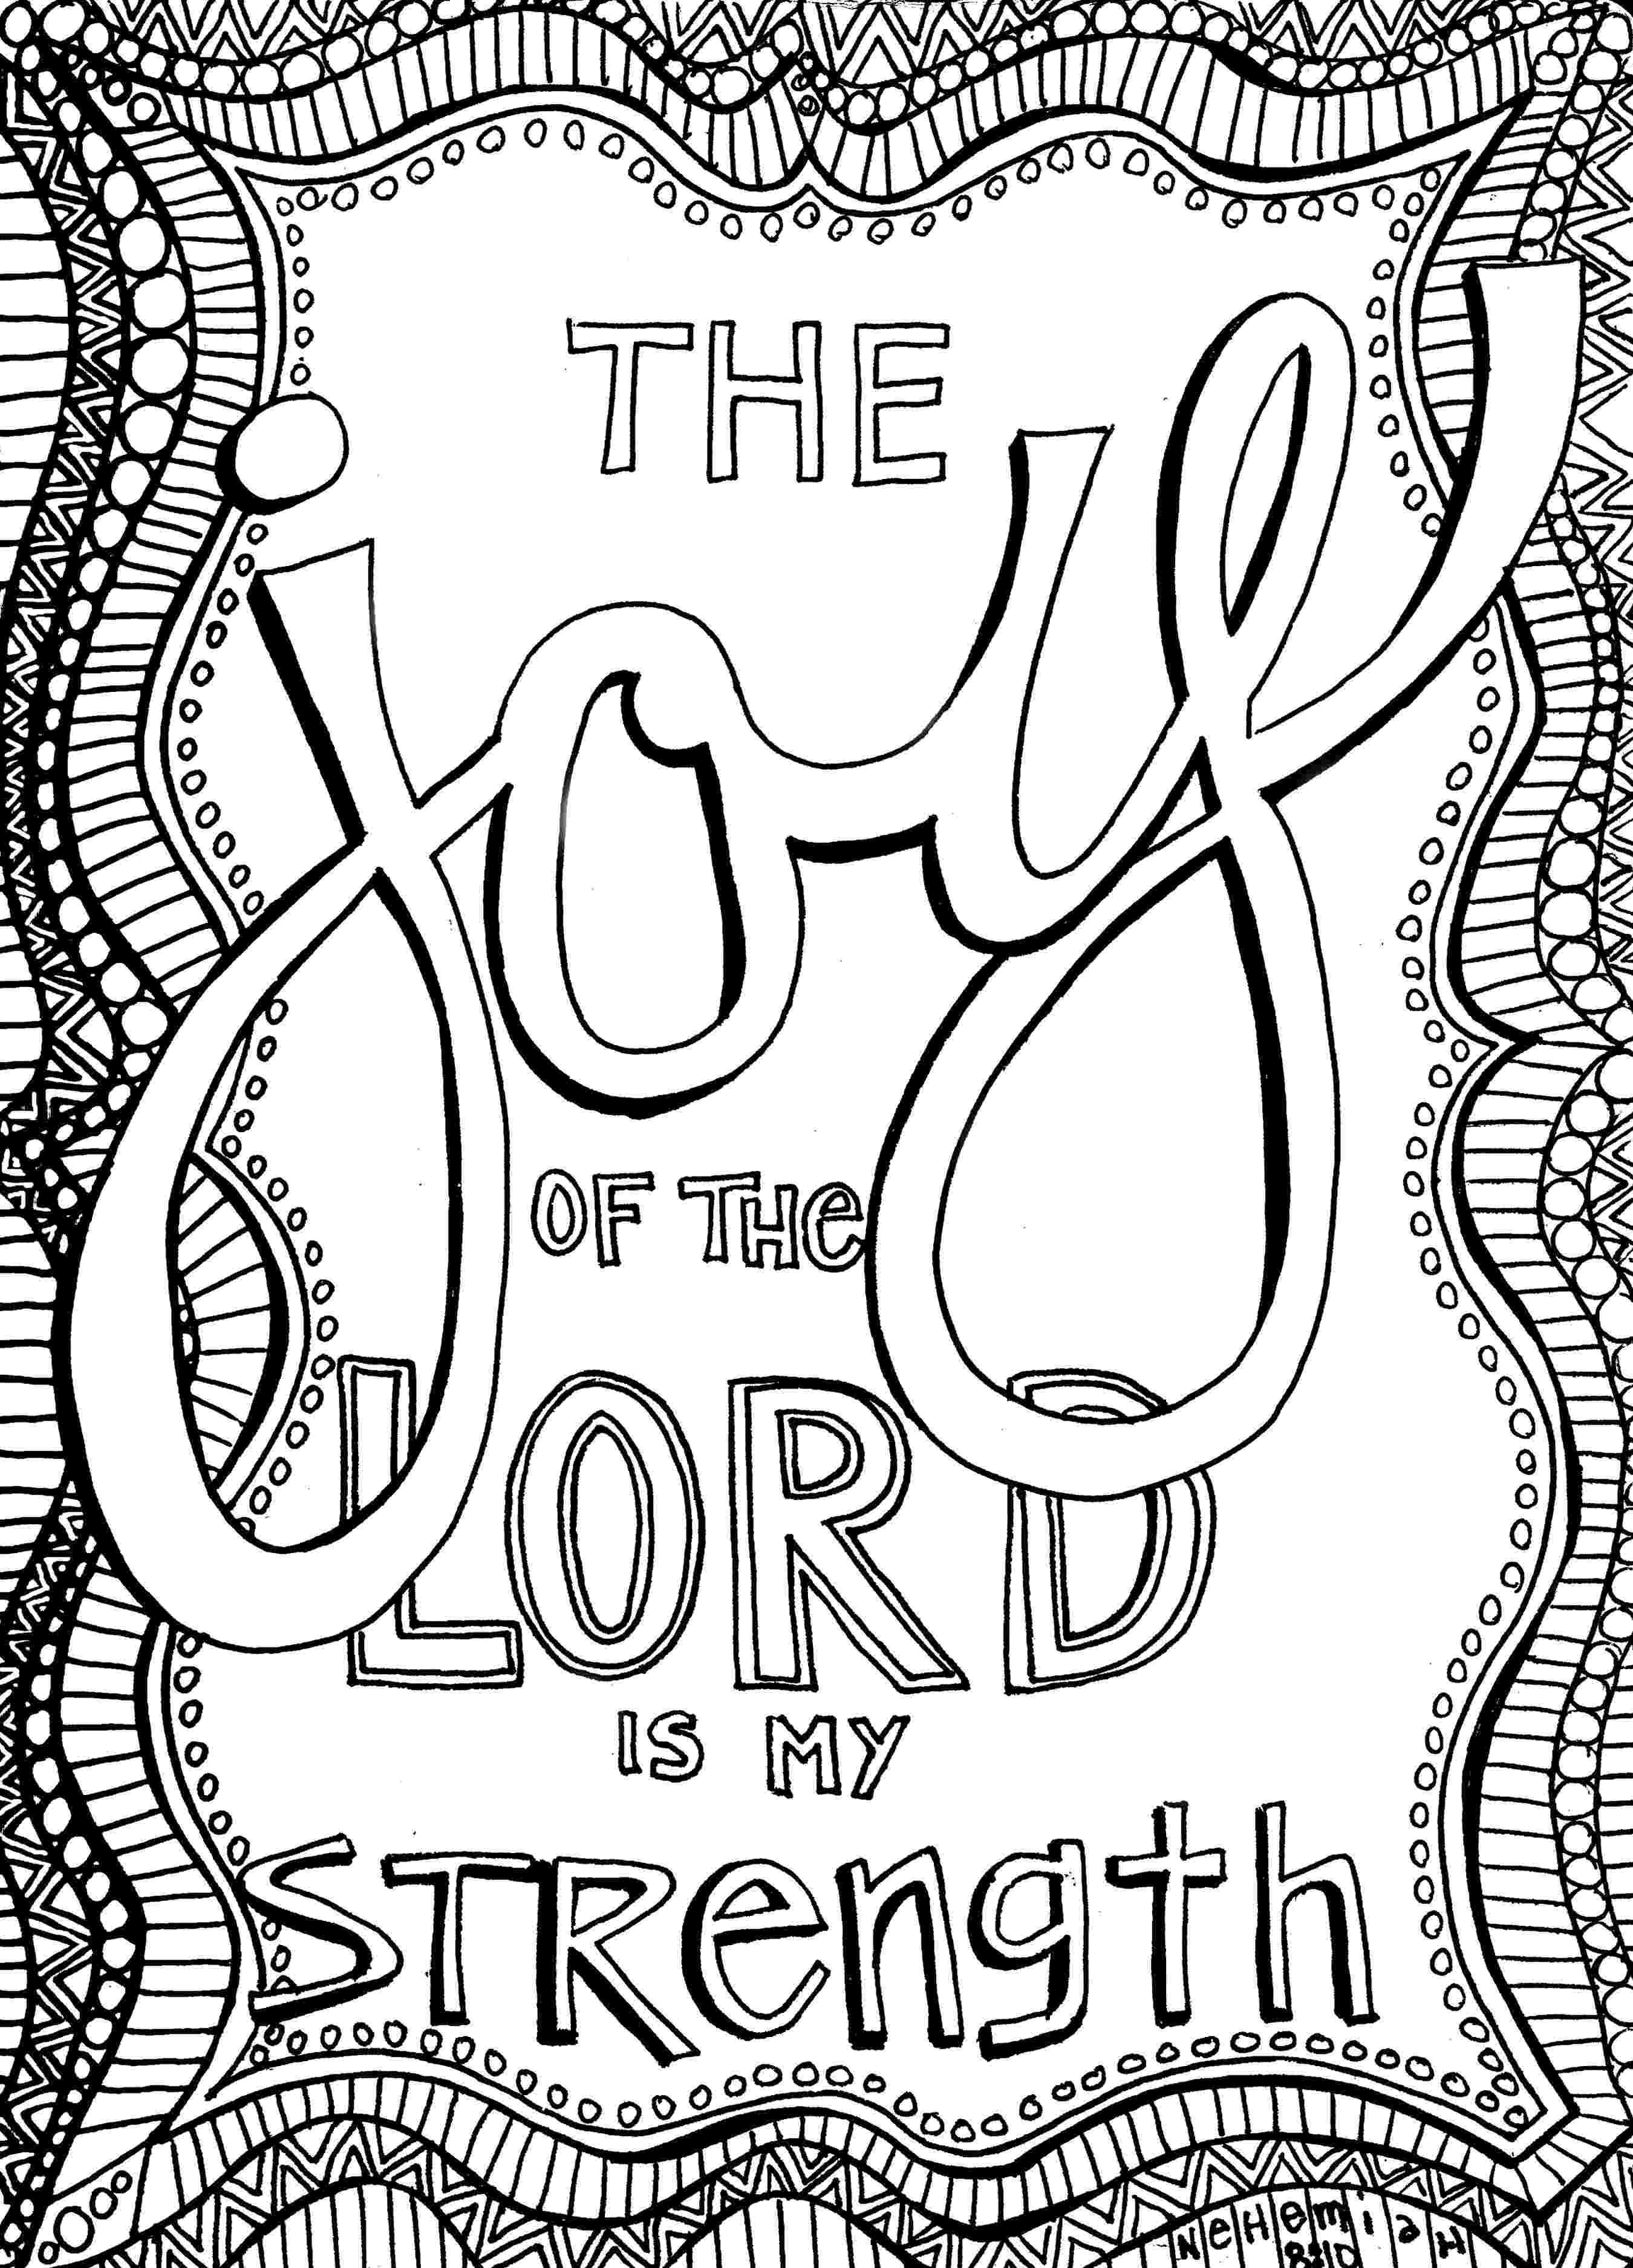 free christian coloring sheets free printable christian coloring pages for kids best sheets coloring christian free